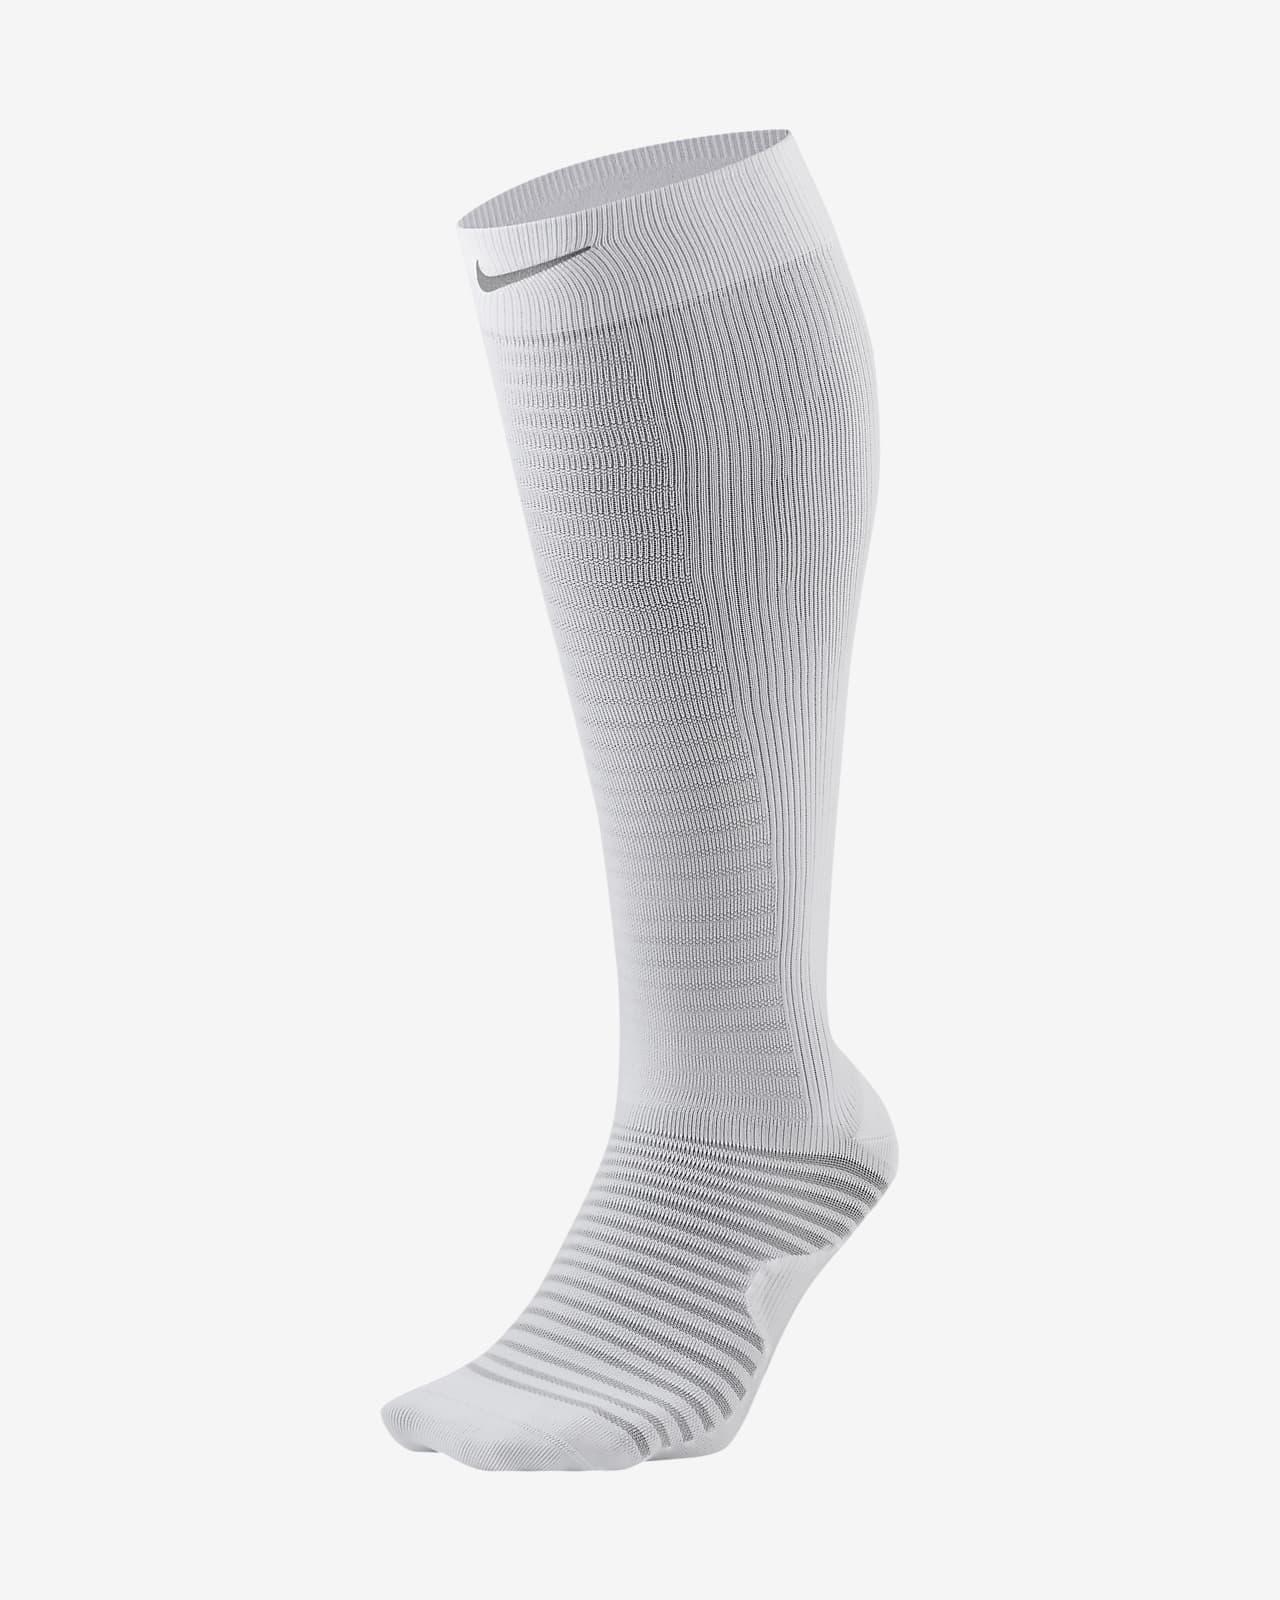 Nike Spark Lightweight Over-The-Calf-Kompressions-Laufsocken